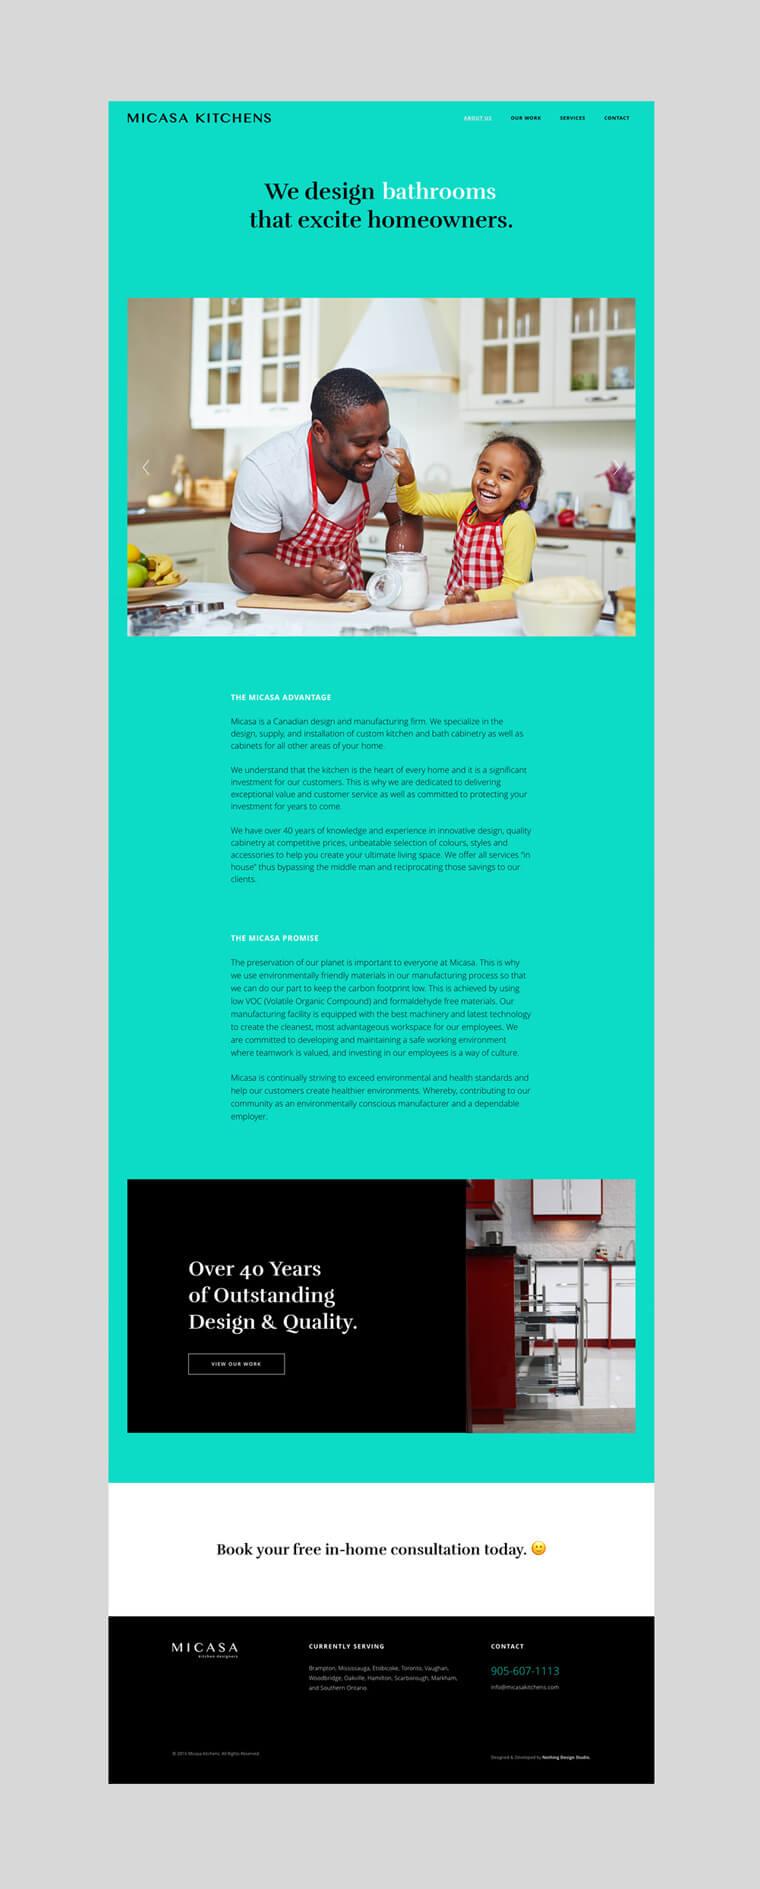 Micasa-website-2